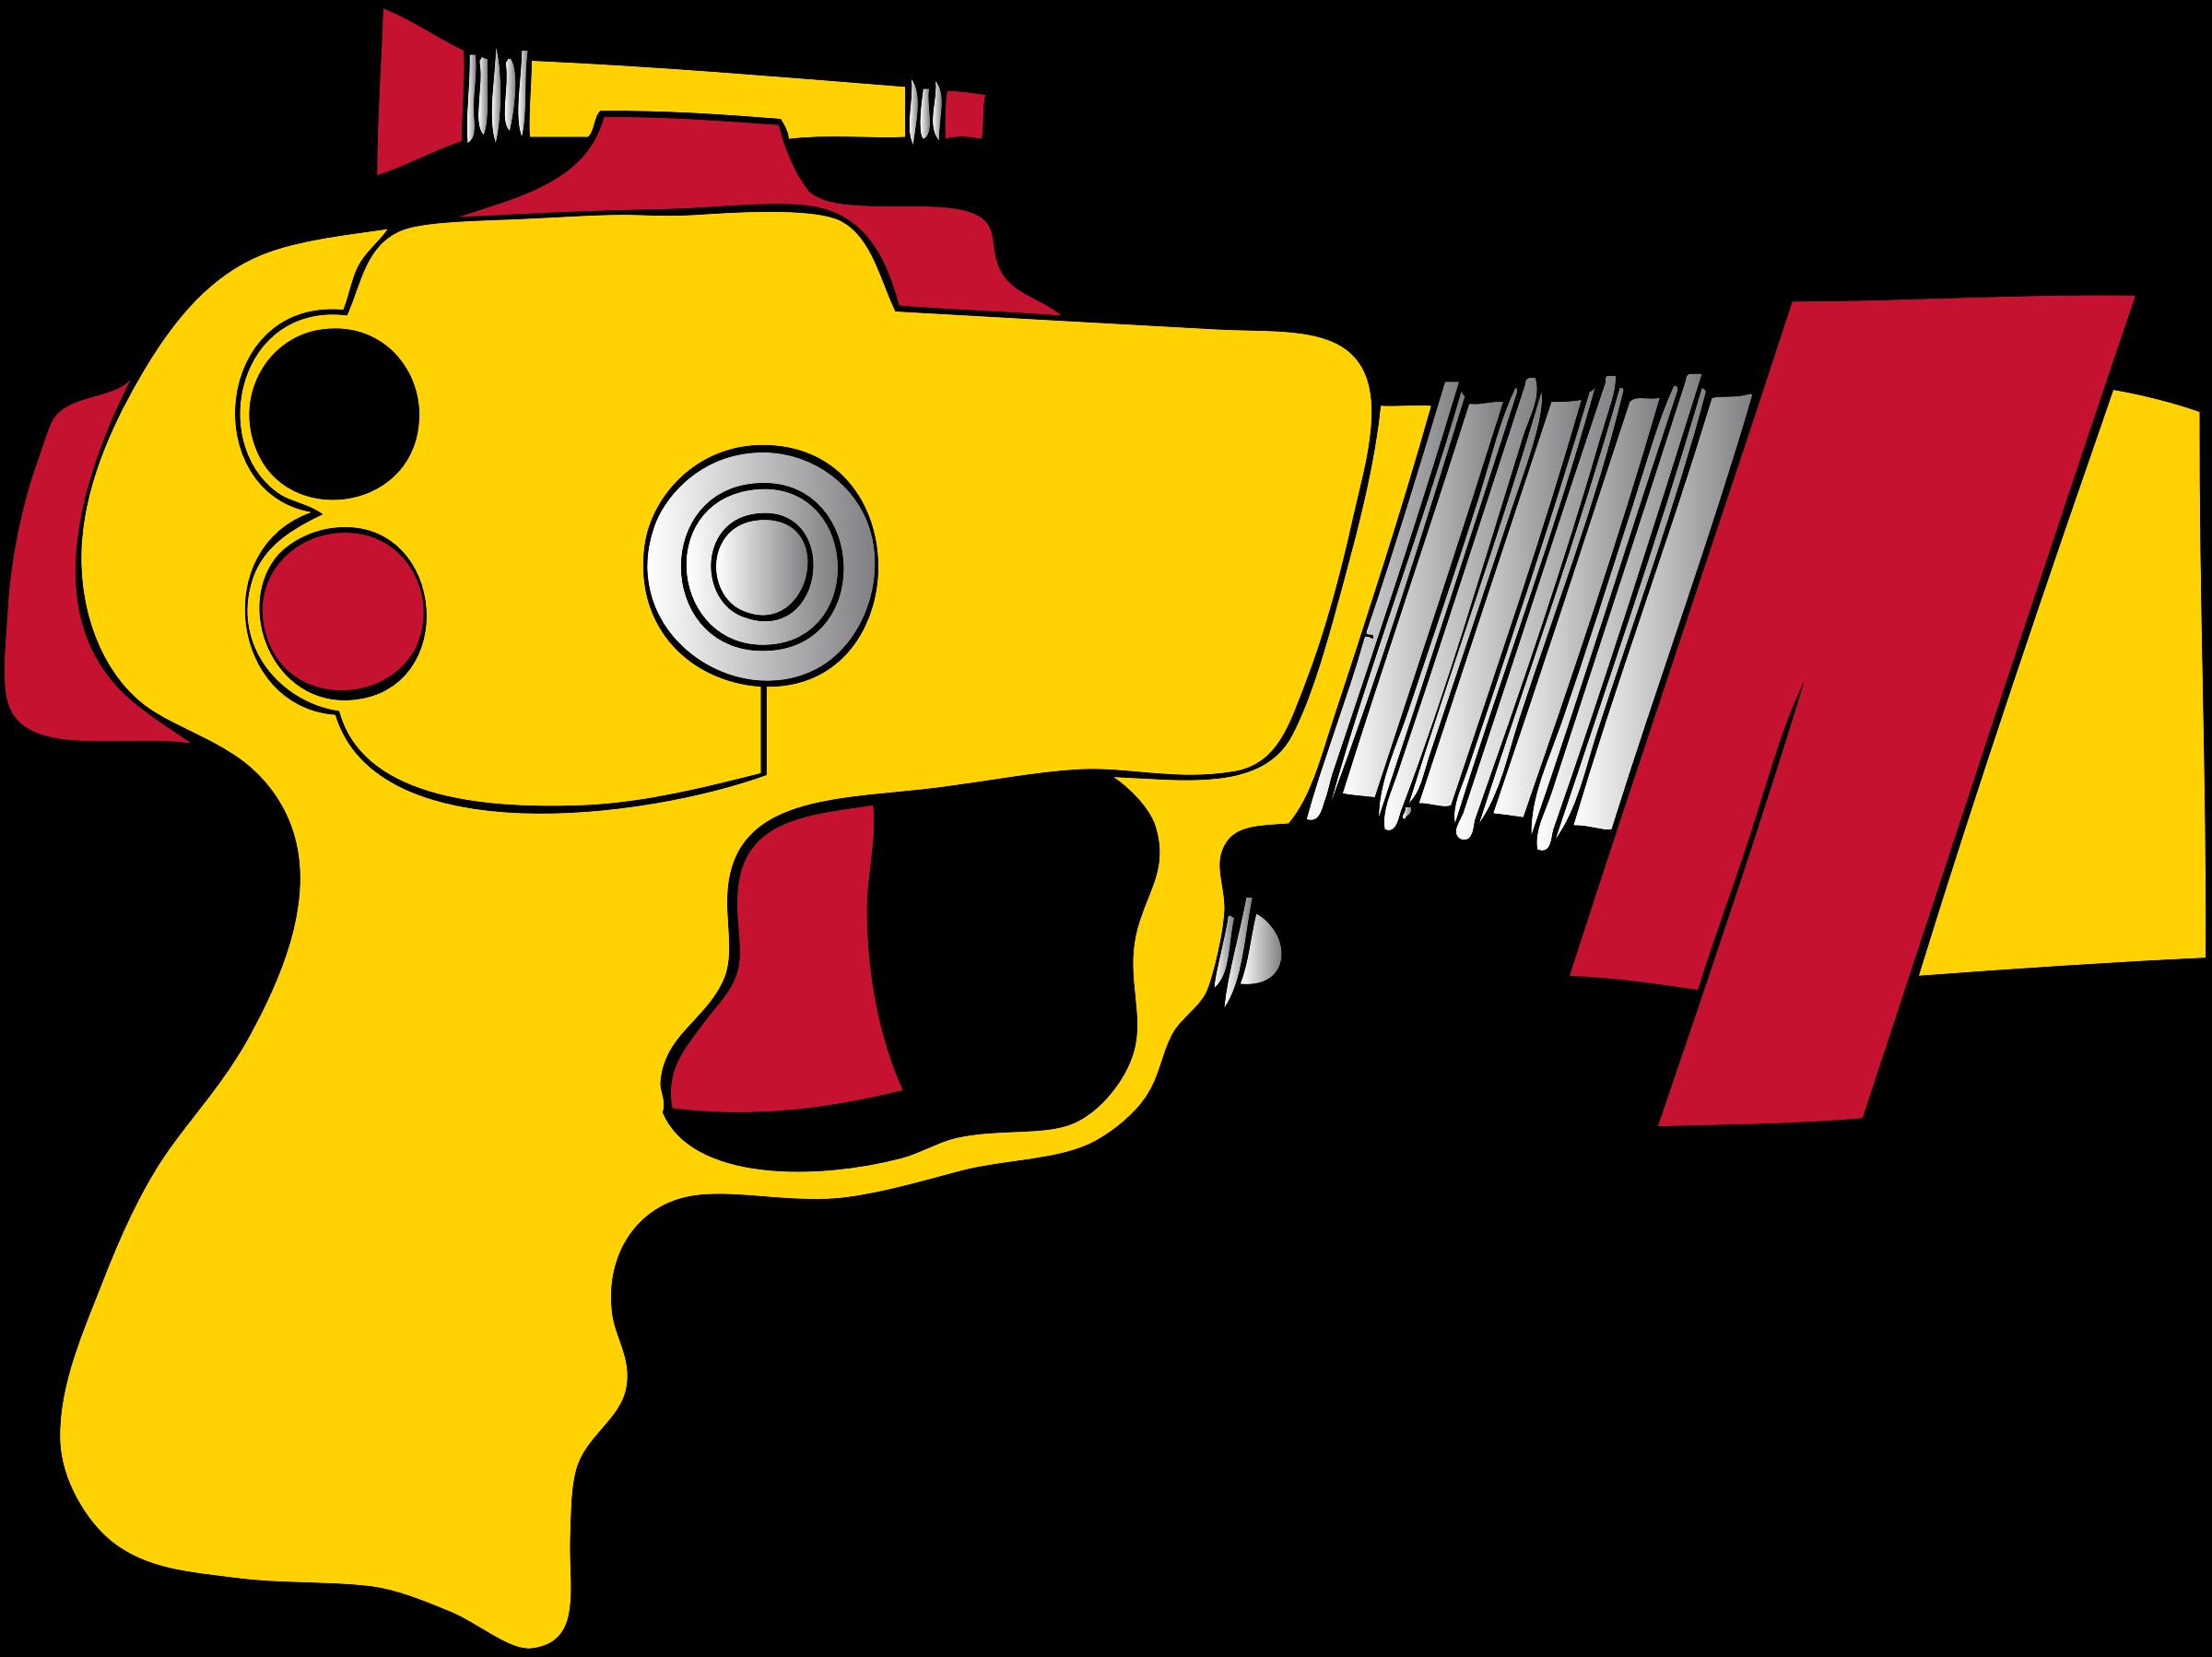 Ray big image png. Clipart gun line art